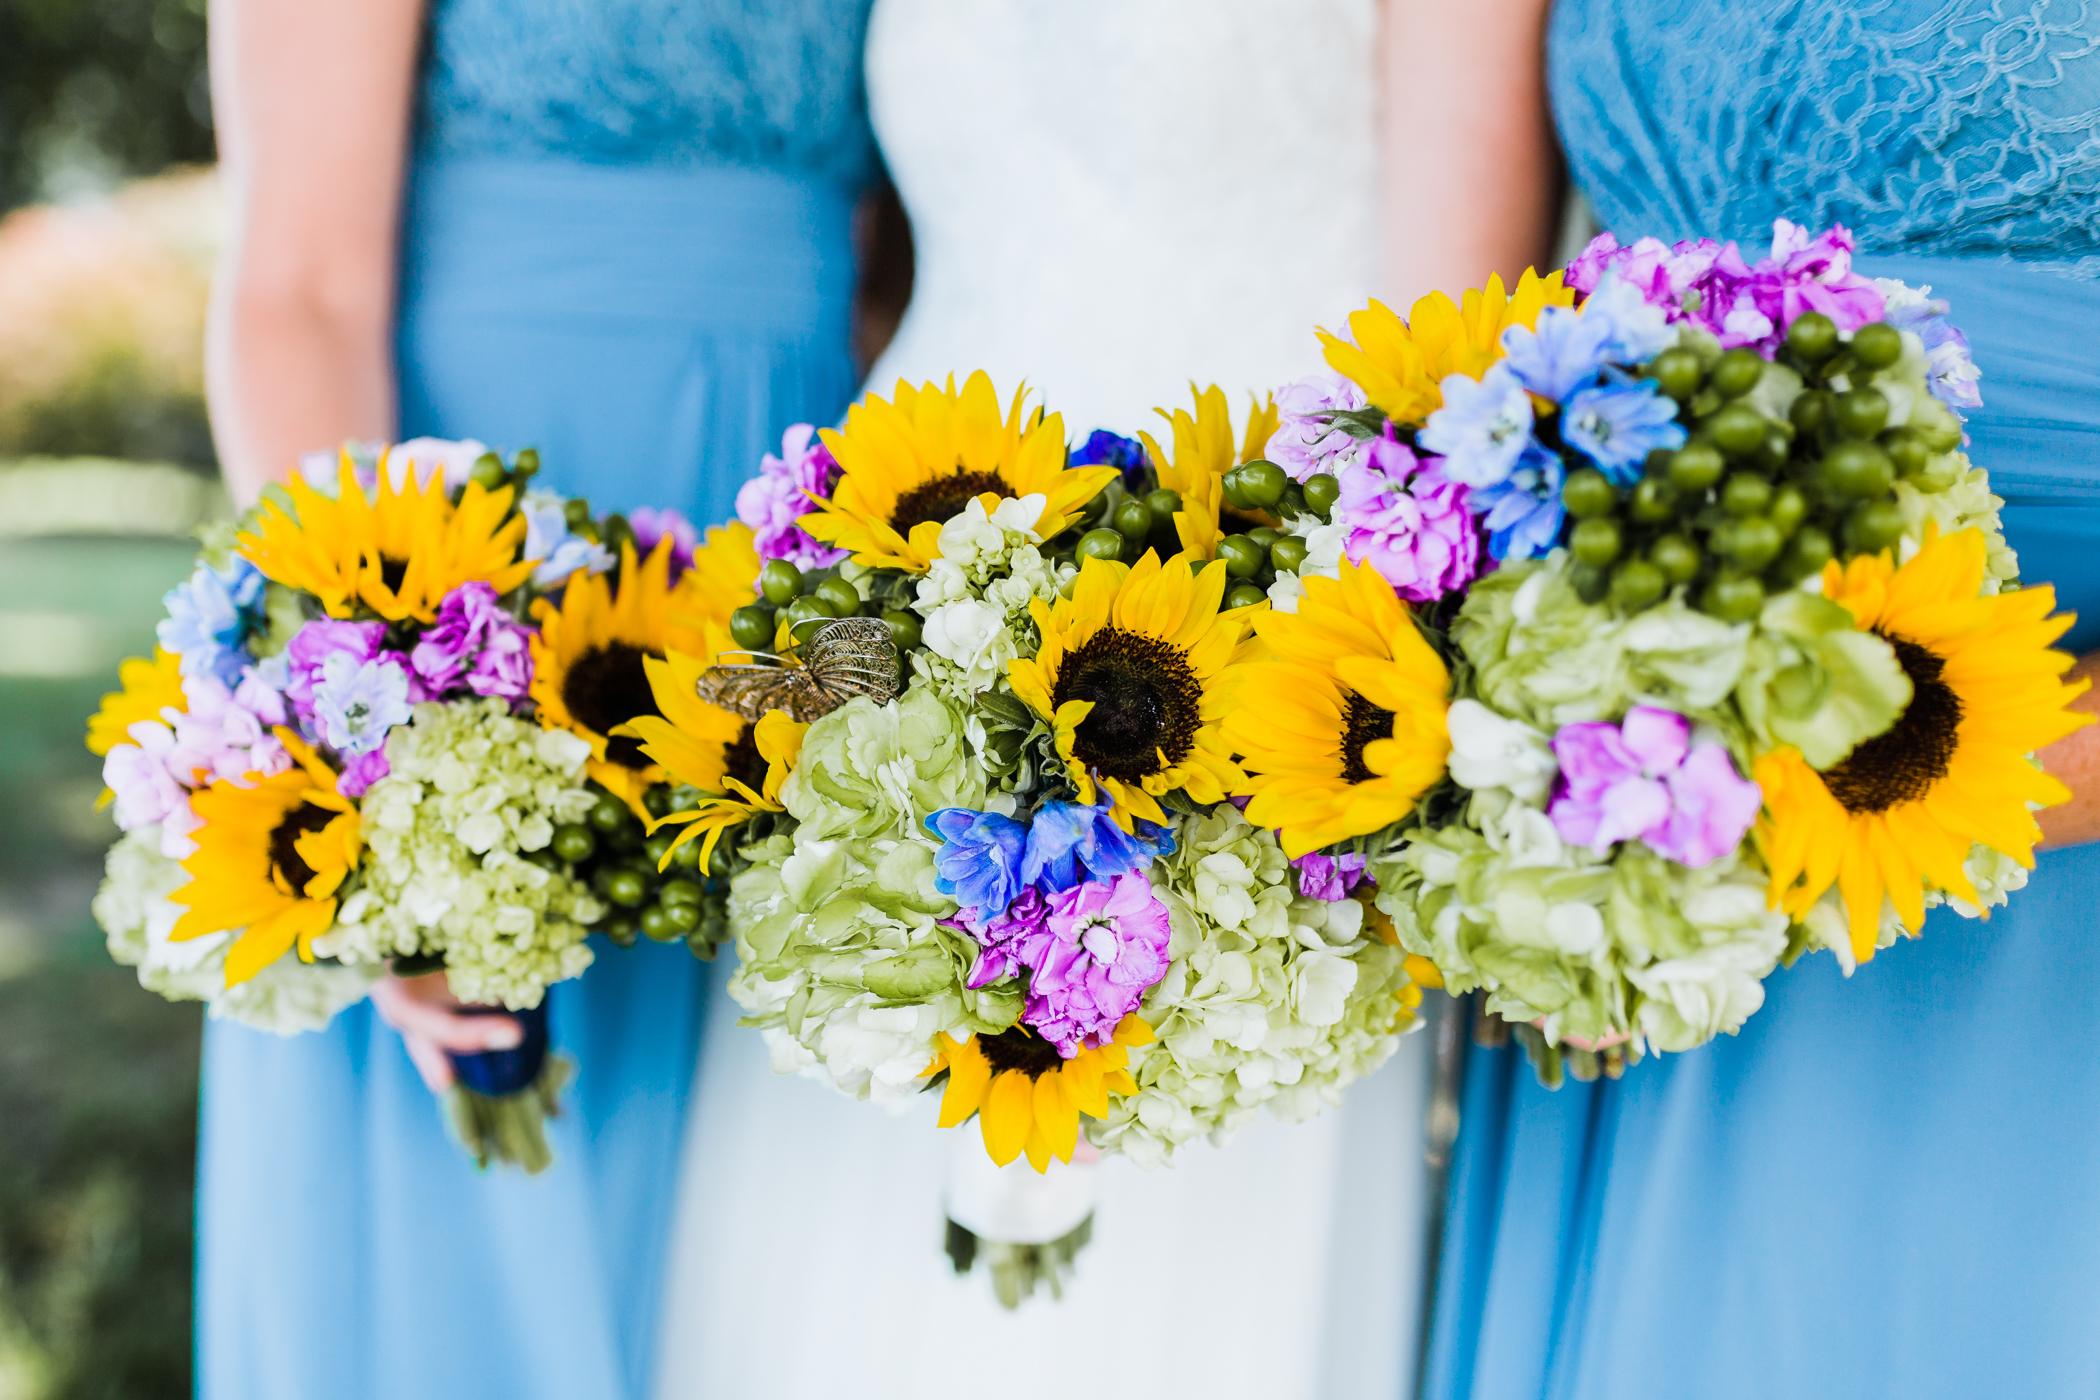 maryland summer wedding - md wedding photographer and cinematographer - husband and wife team